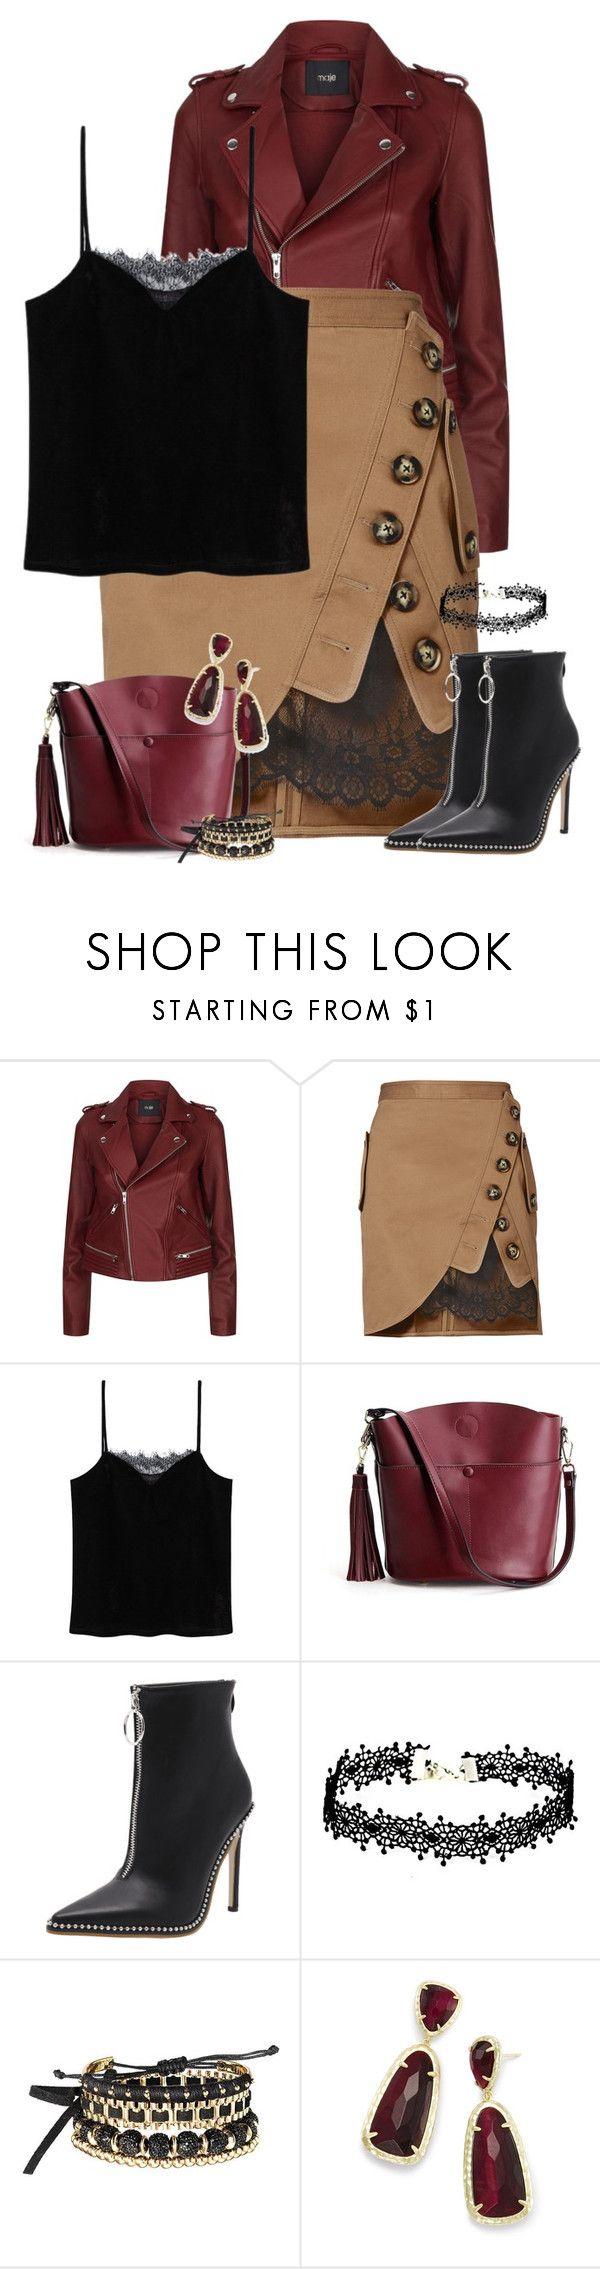 """Leather Jacket & Lace Utility Skirt"" by majezy ❤ liked on Polyvore featuring Maje, self-portrait, MANGO, Avon and Kendra Scott"